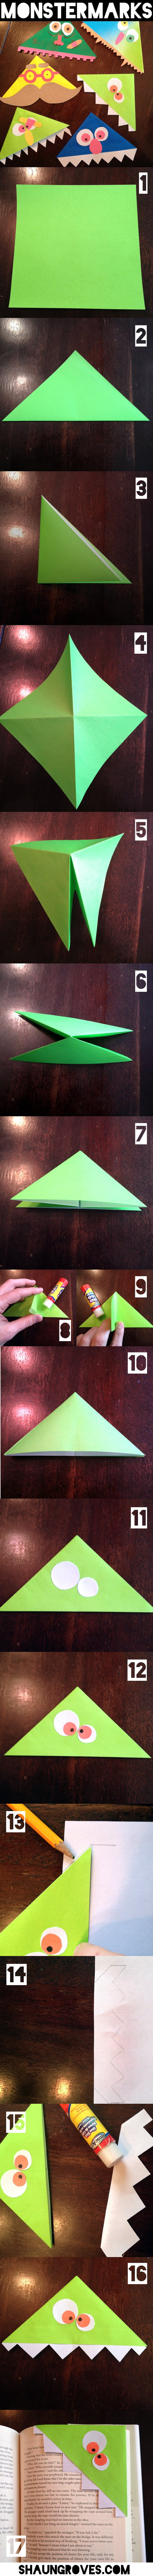 Monstermarks bookmark kid craft tutorial